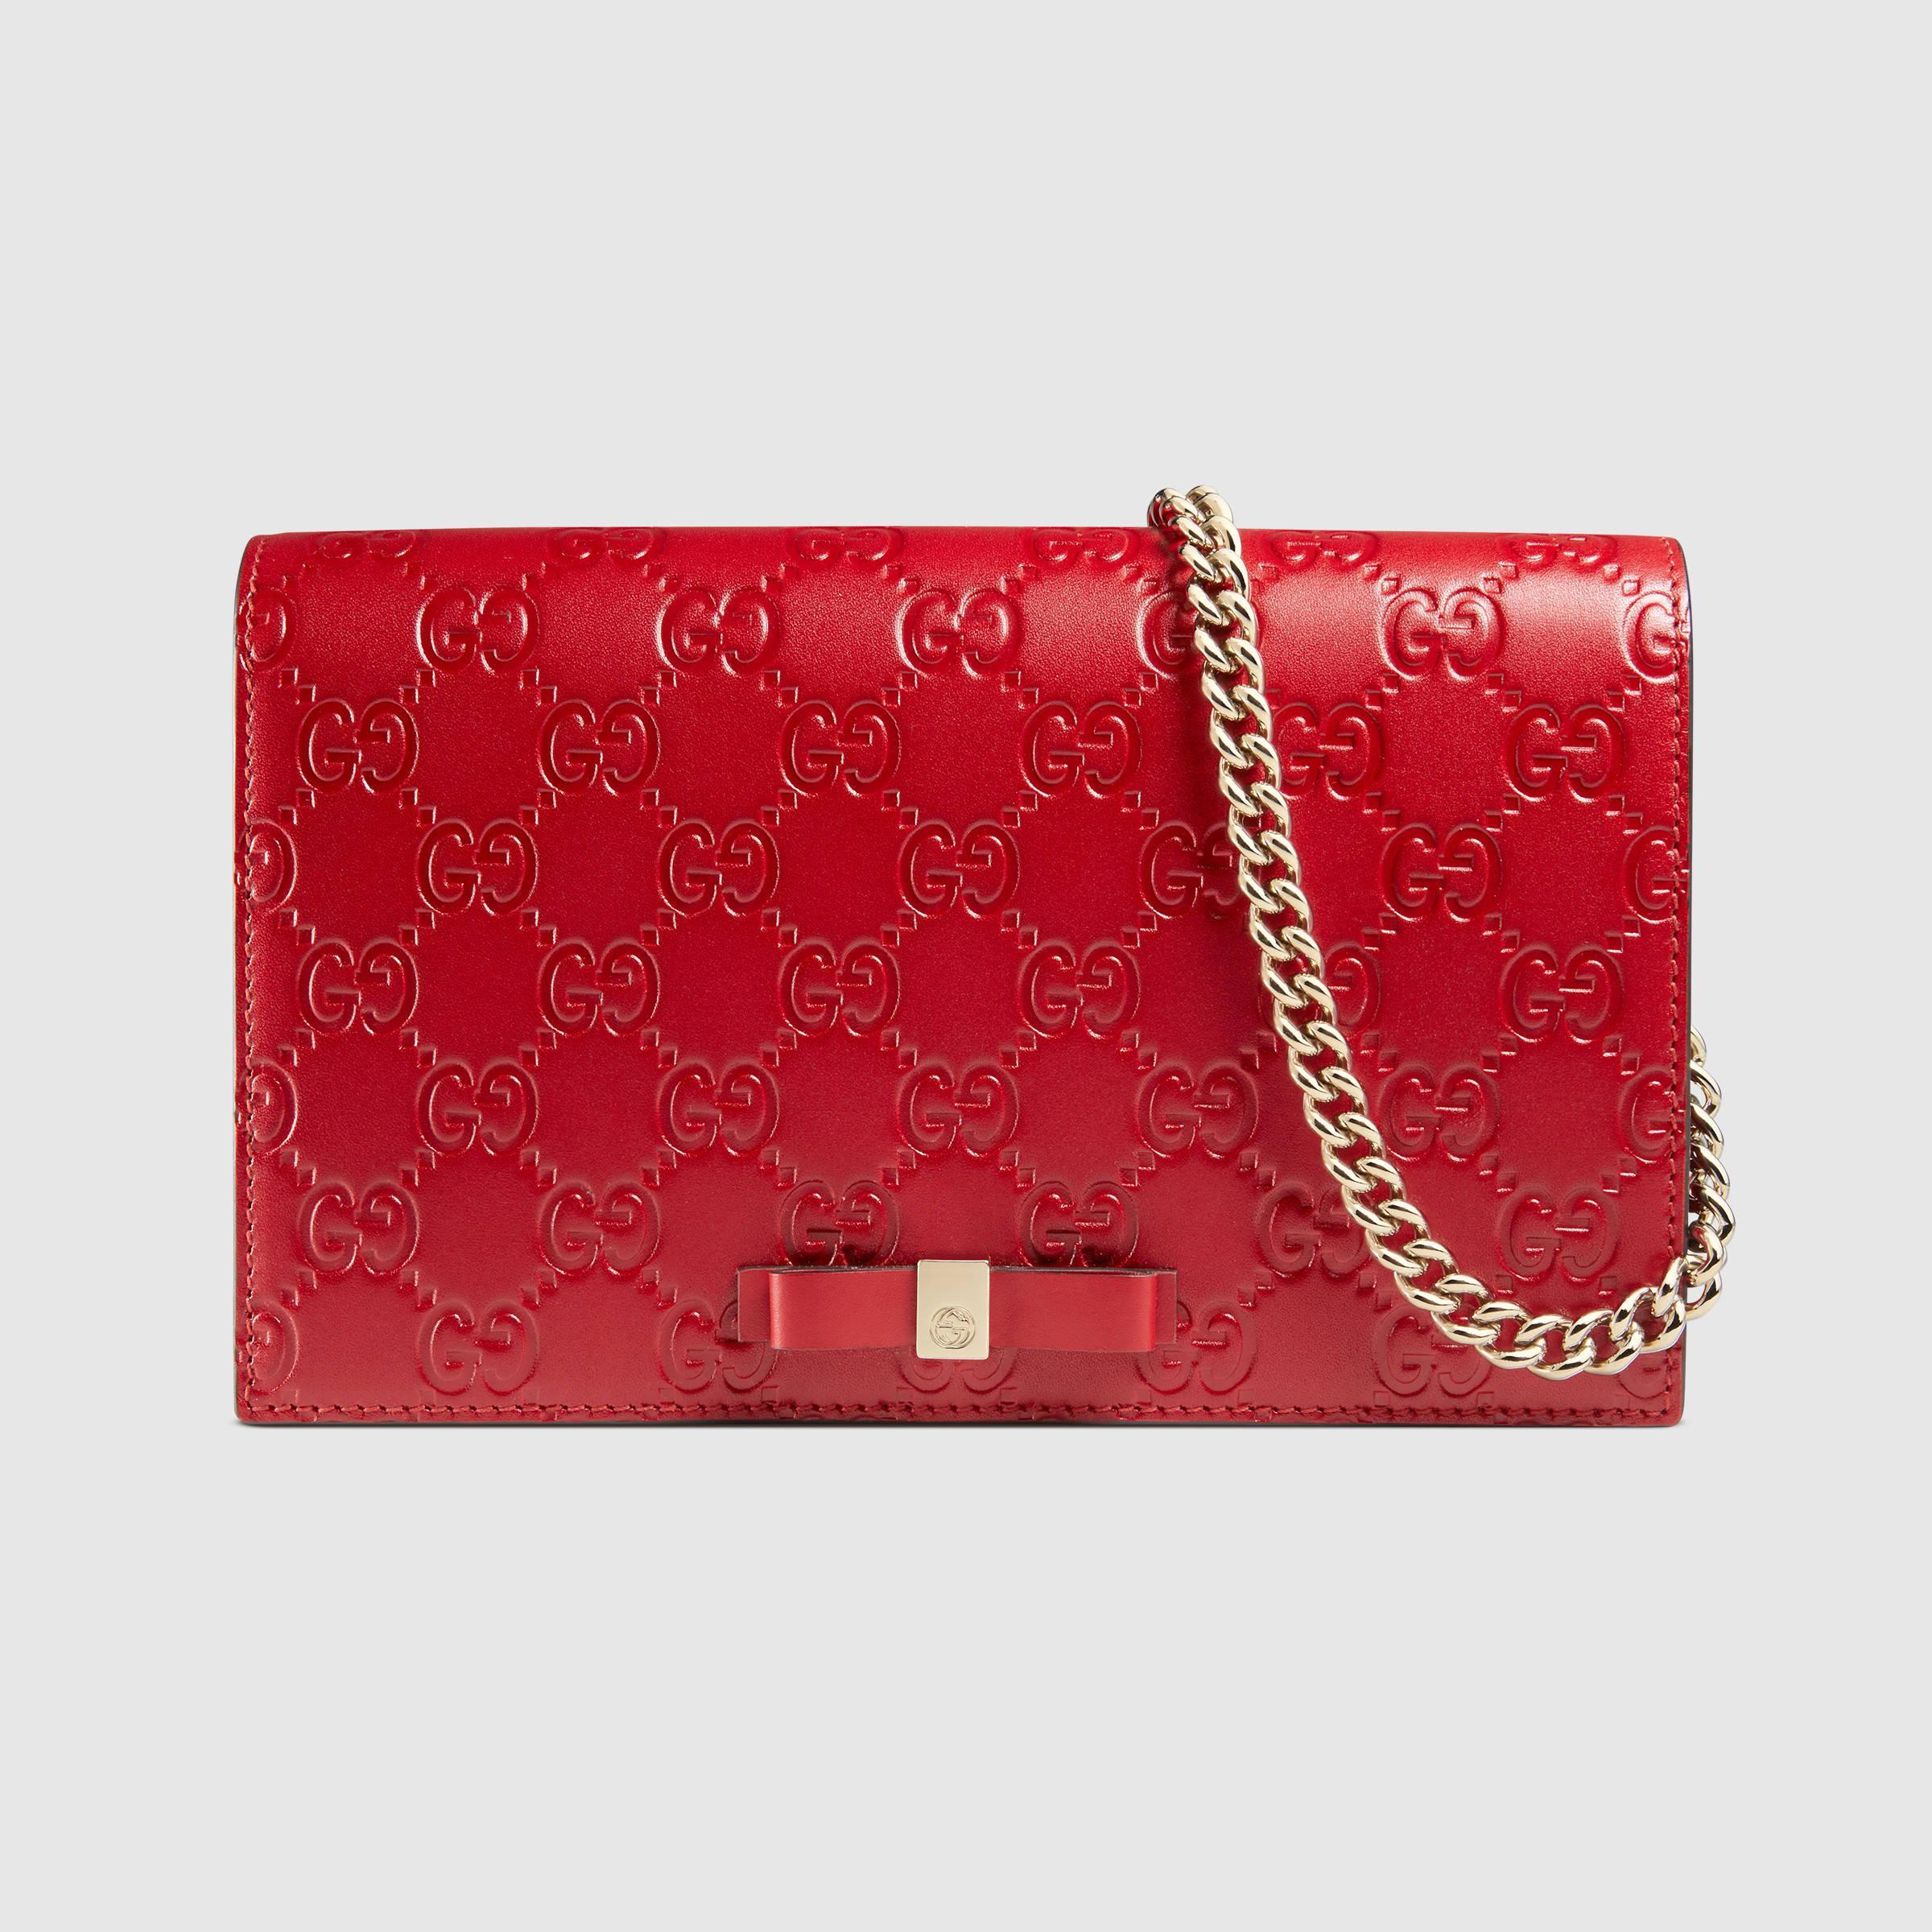 4b59edbe7 Gucci Signature Mini Shoulder Bag in Red - Lyst